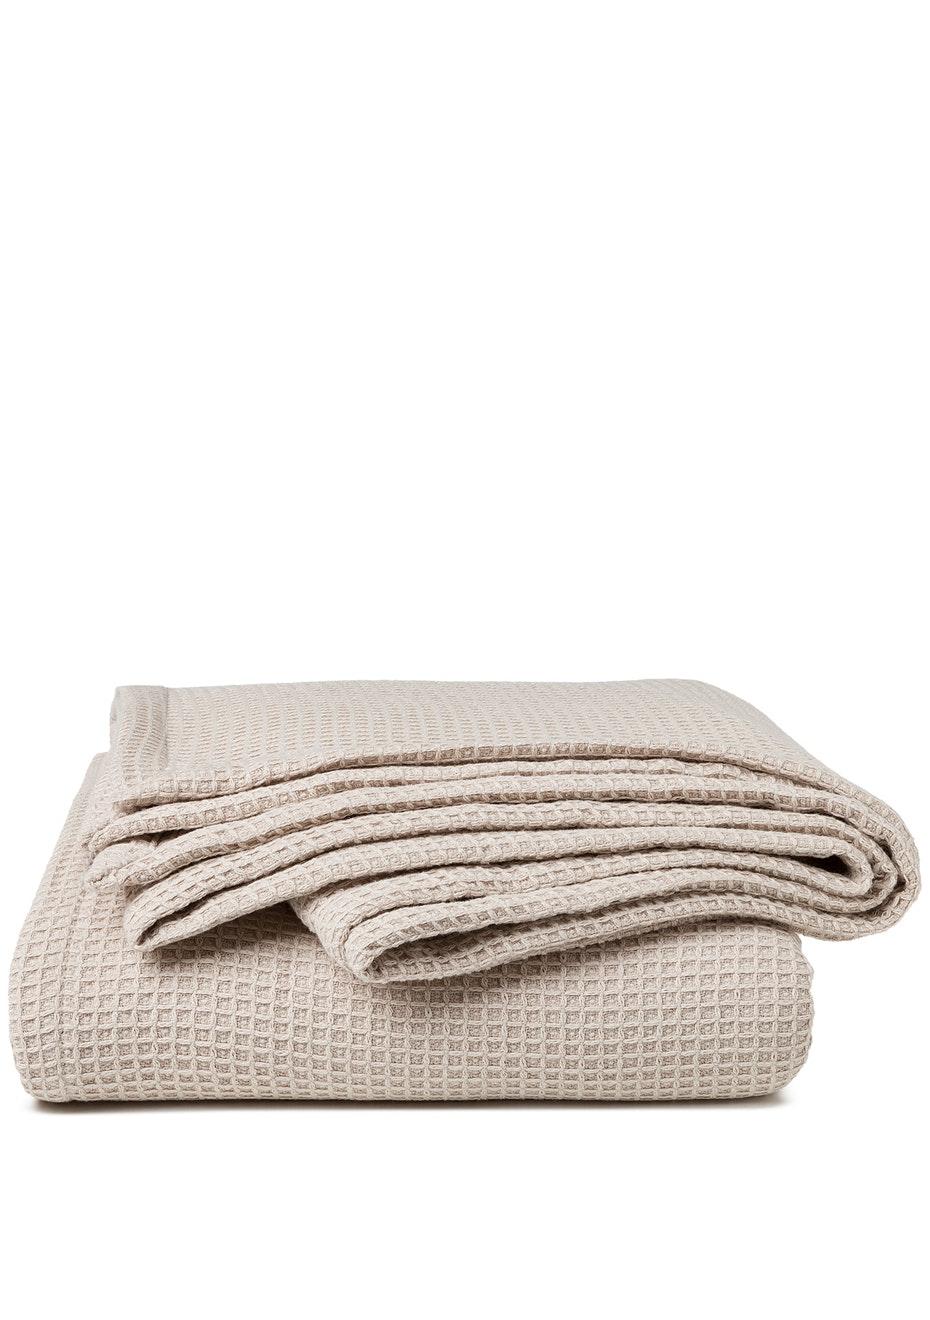 Sogno Linen Blend  Blanket Sandstone